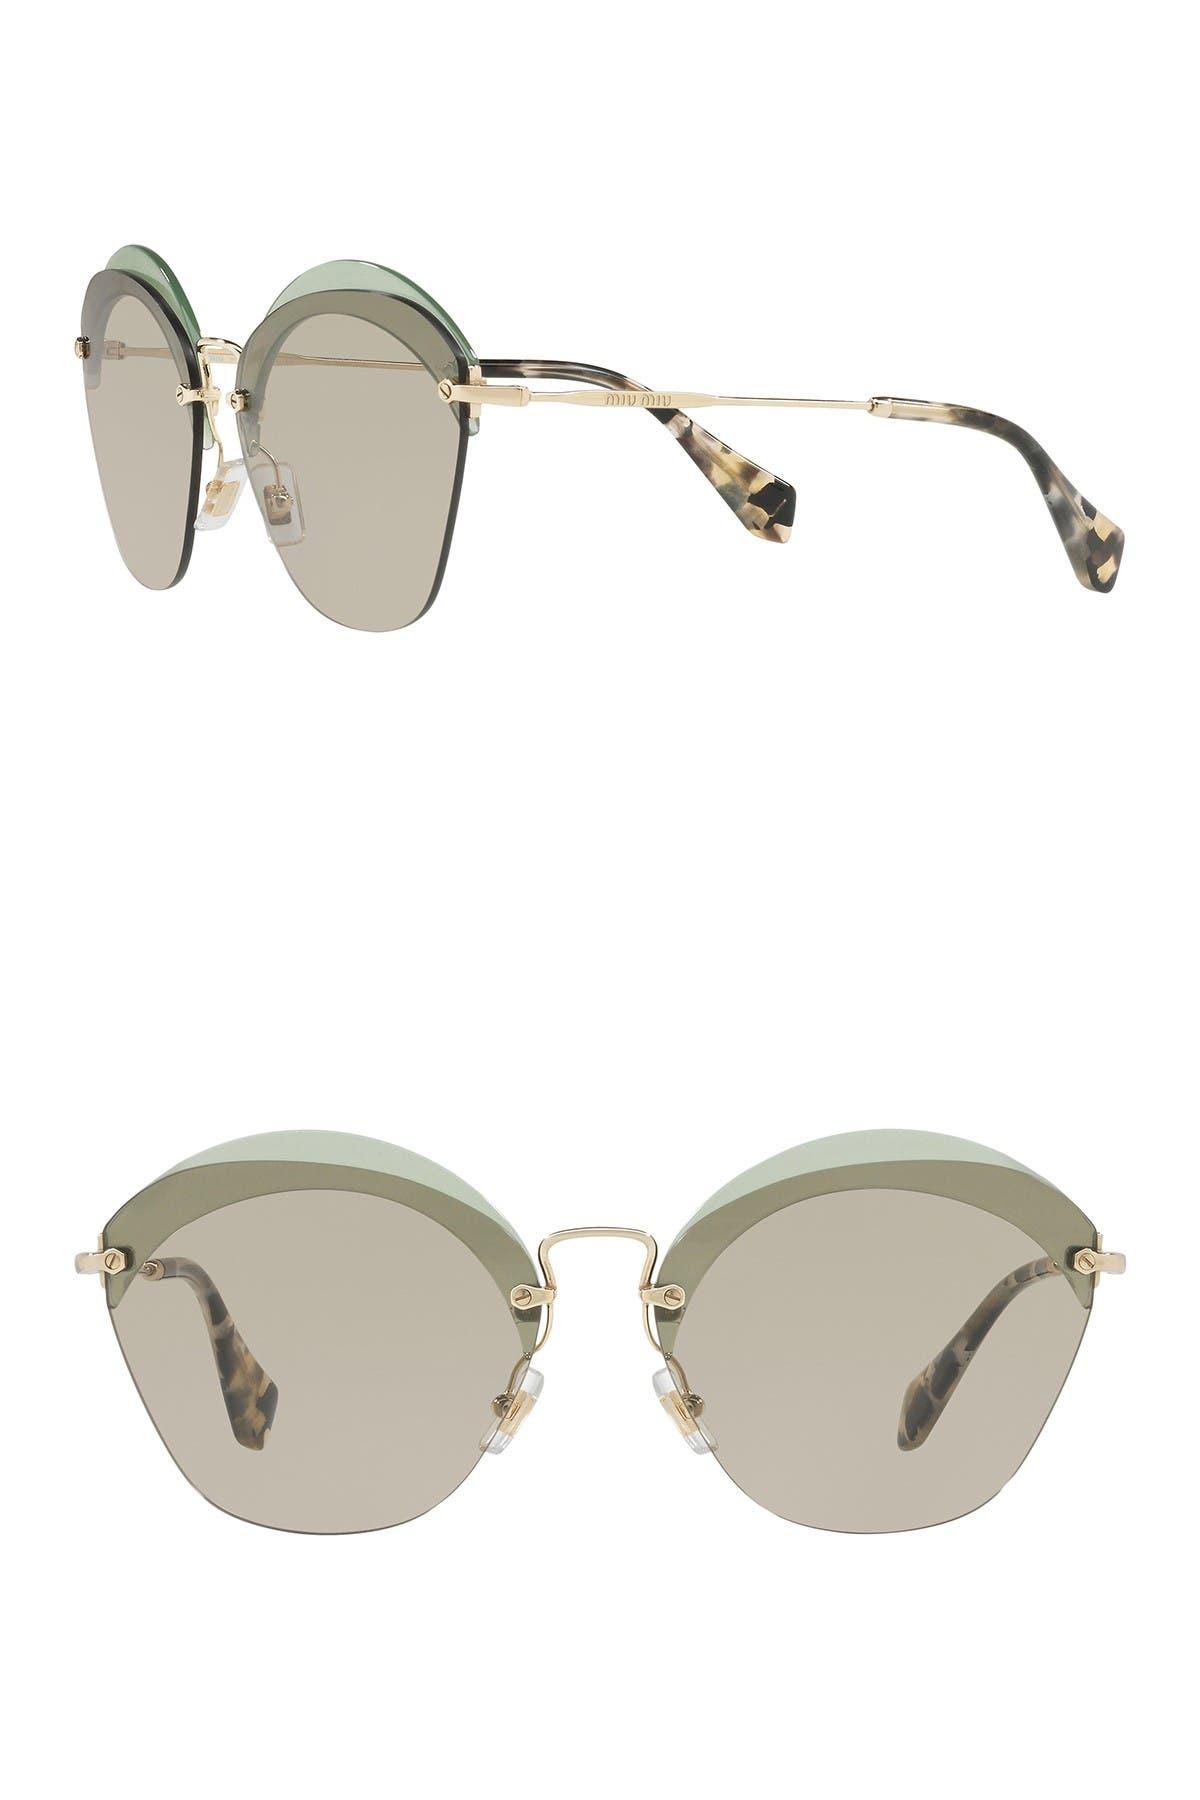 Image of MIU MIU 62mm Irregular Oval Sunglasses